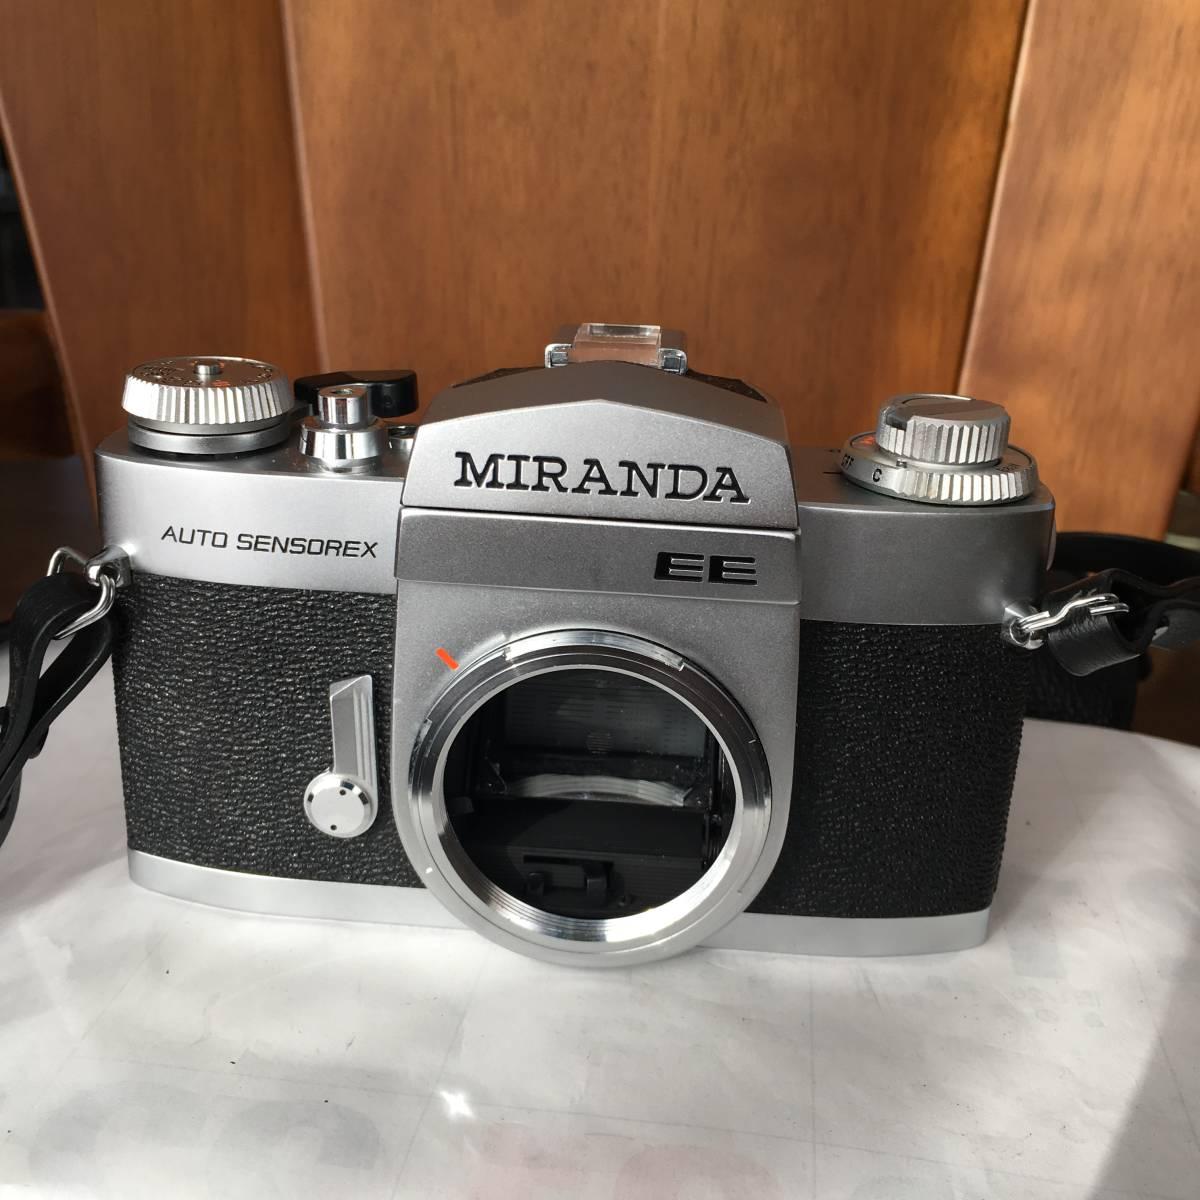 MIRANDA EE AUTO SENSOREX カメラ ボディのみ 中古 ジャンク扱い_画像2